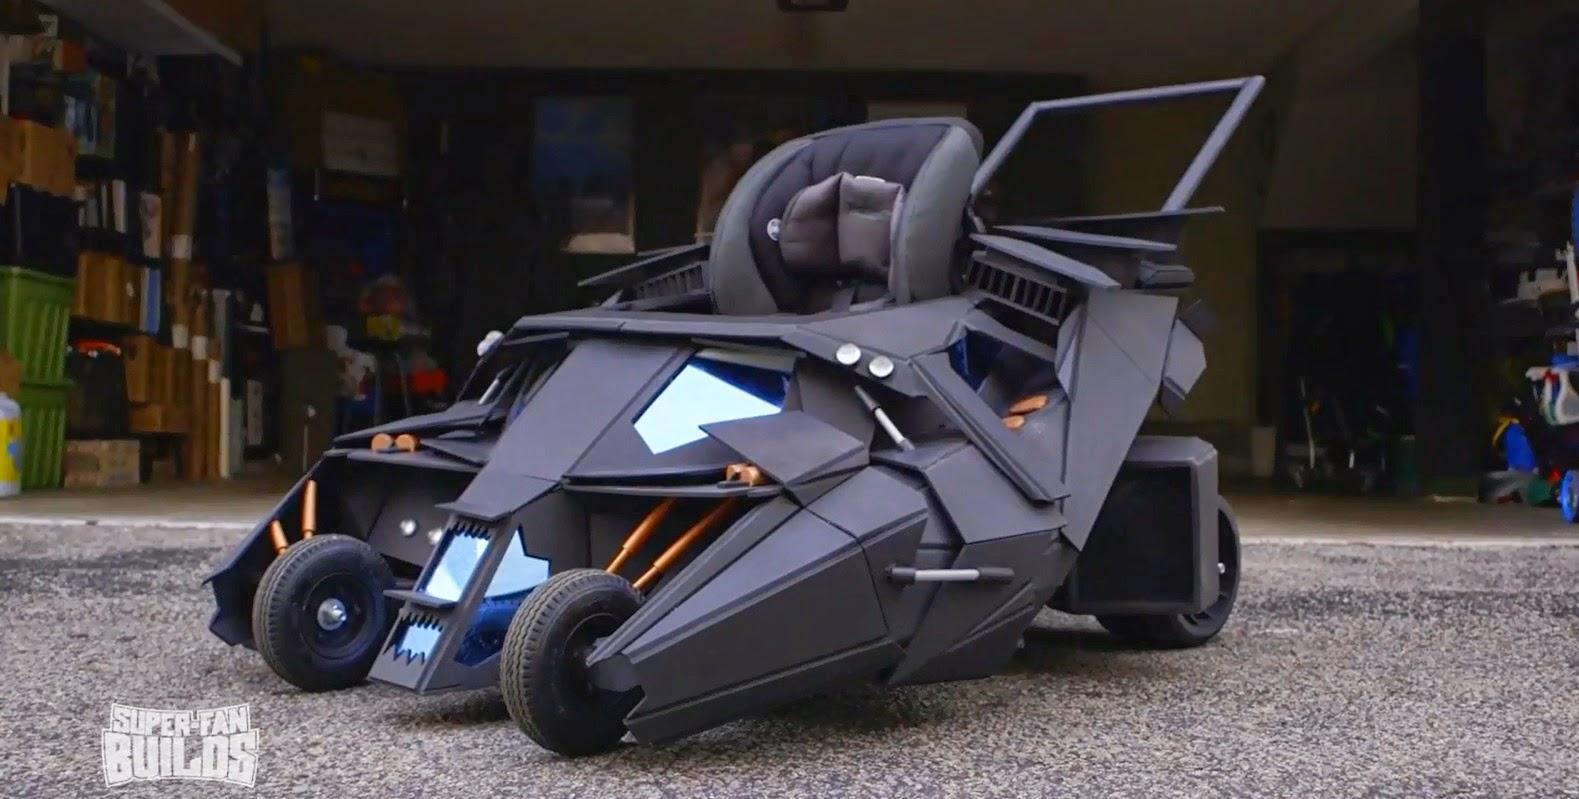 Einzigartig Batmobil Als Kinderwagen Myauto24 Das